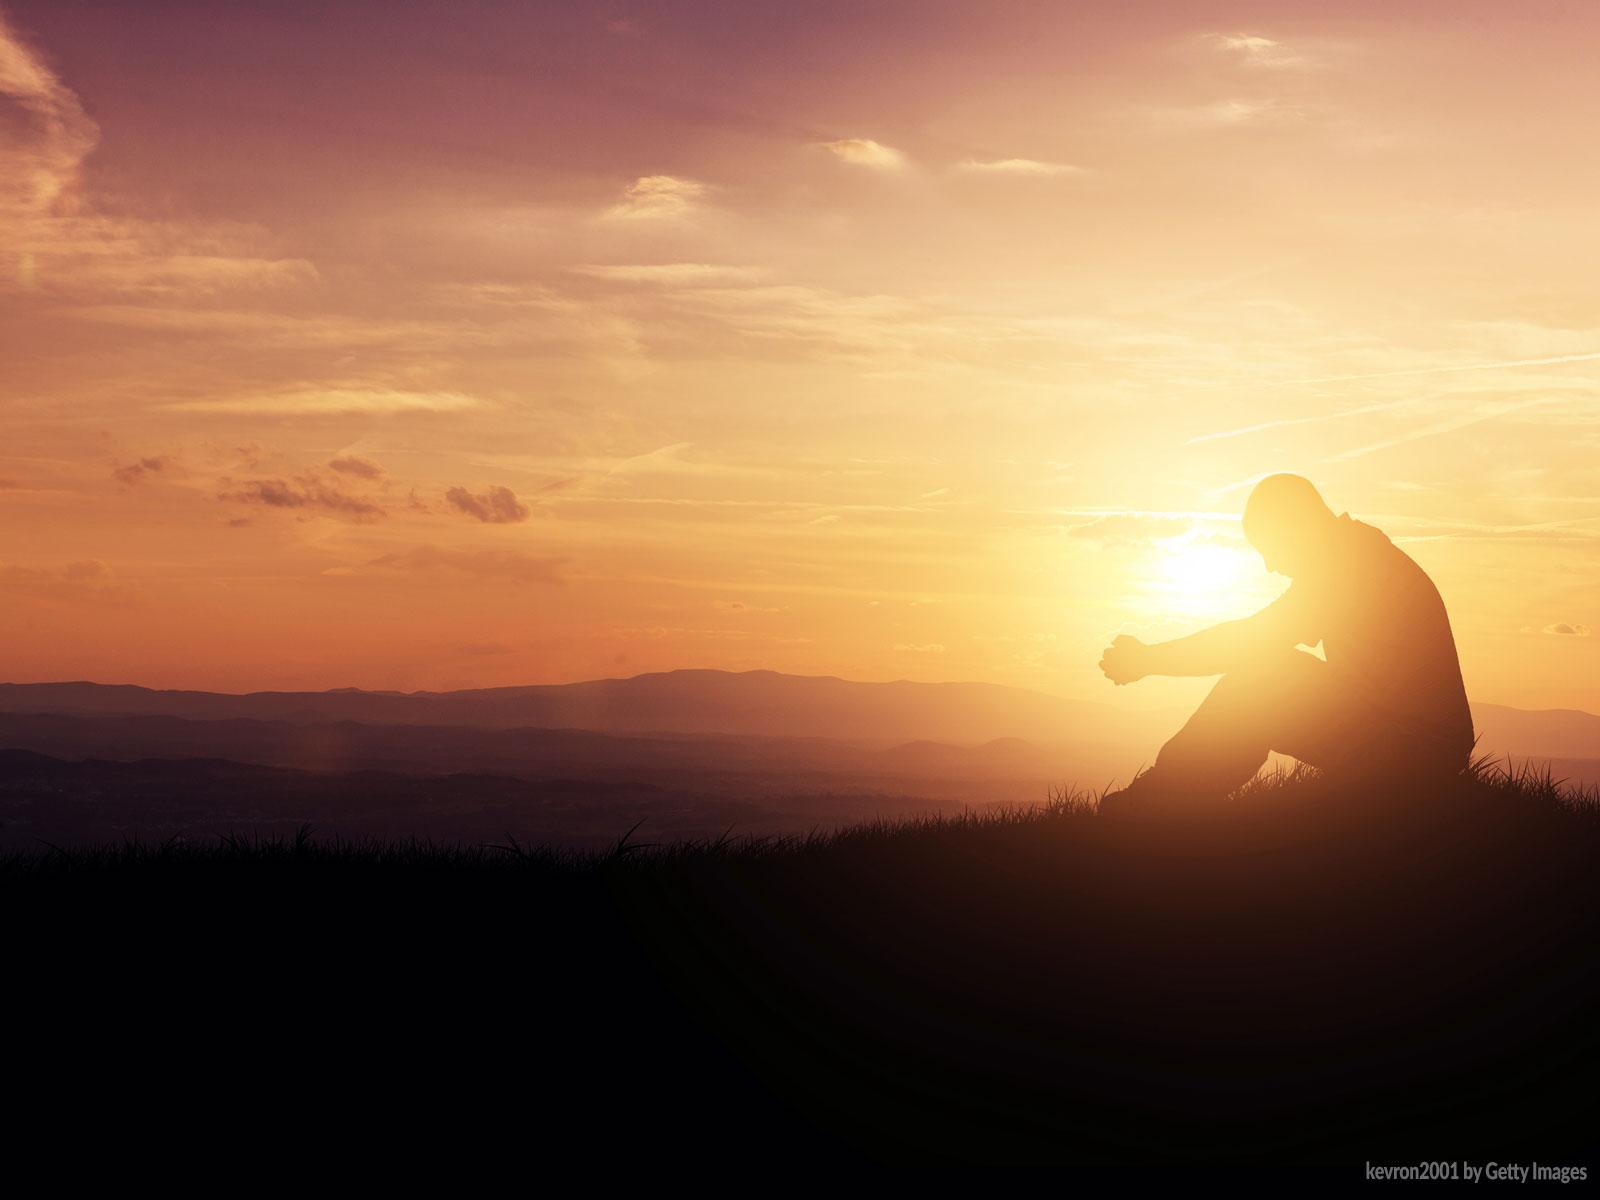 Como-podemos-refletir-a-luz-do-mundo-que-é-Deus